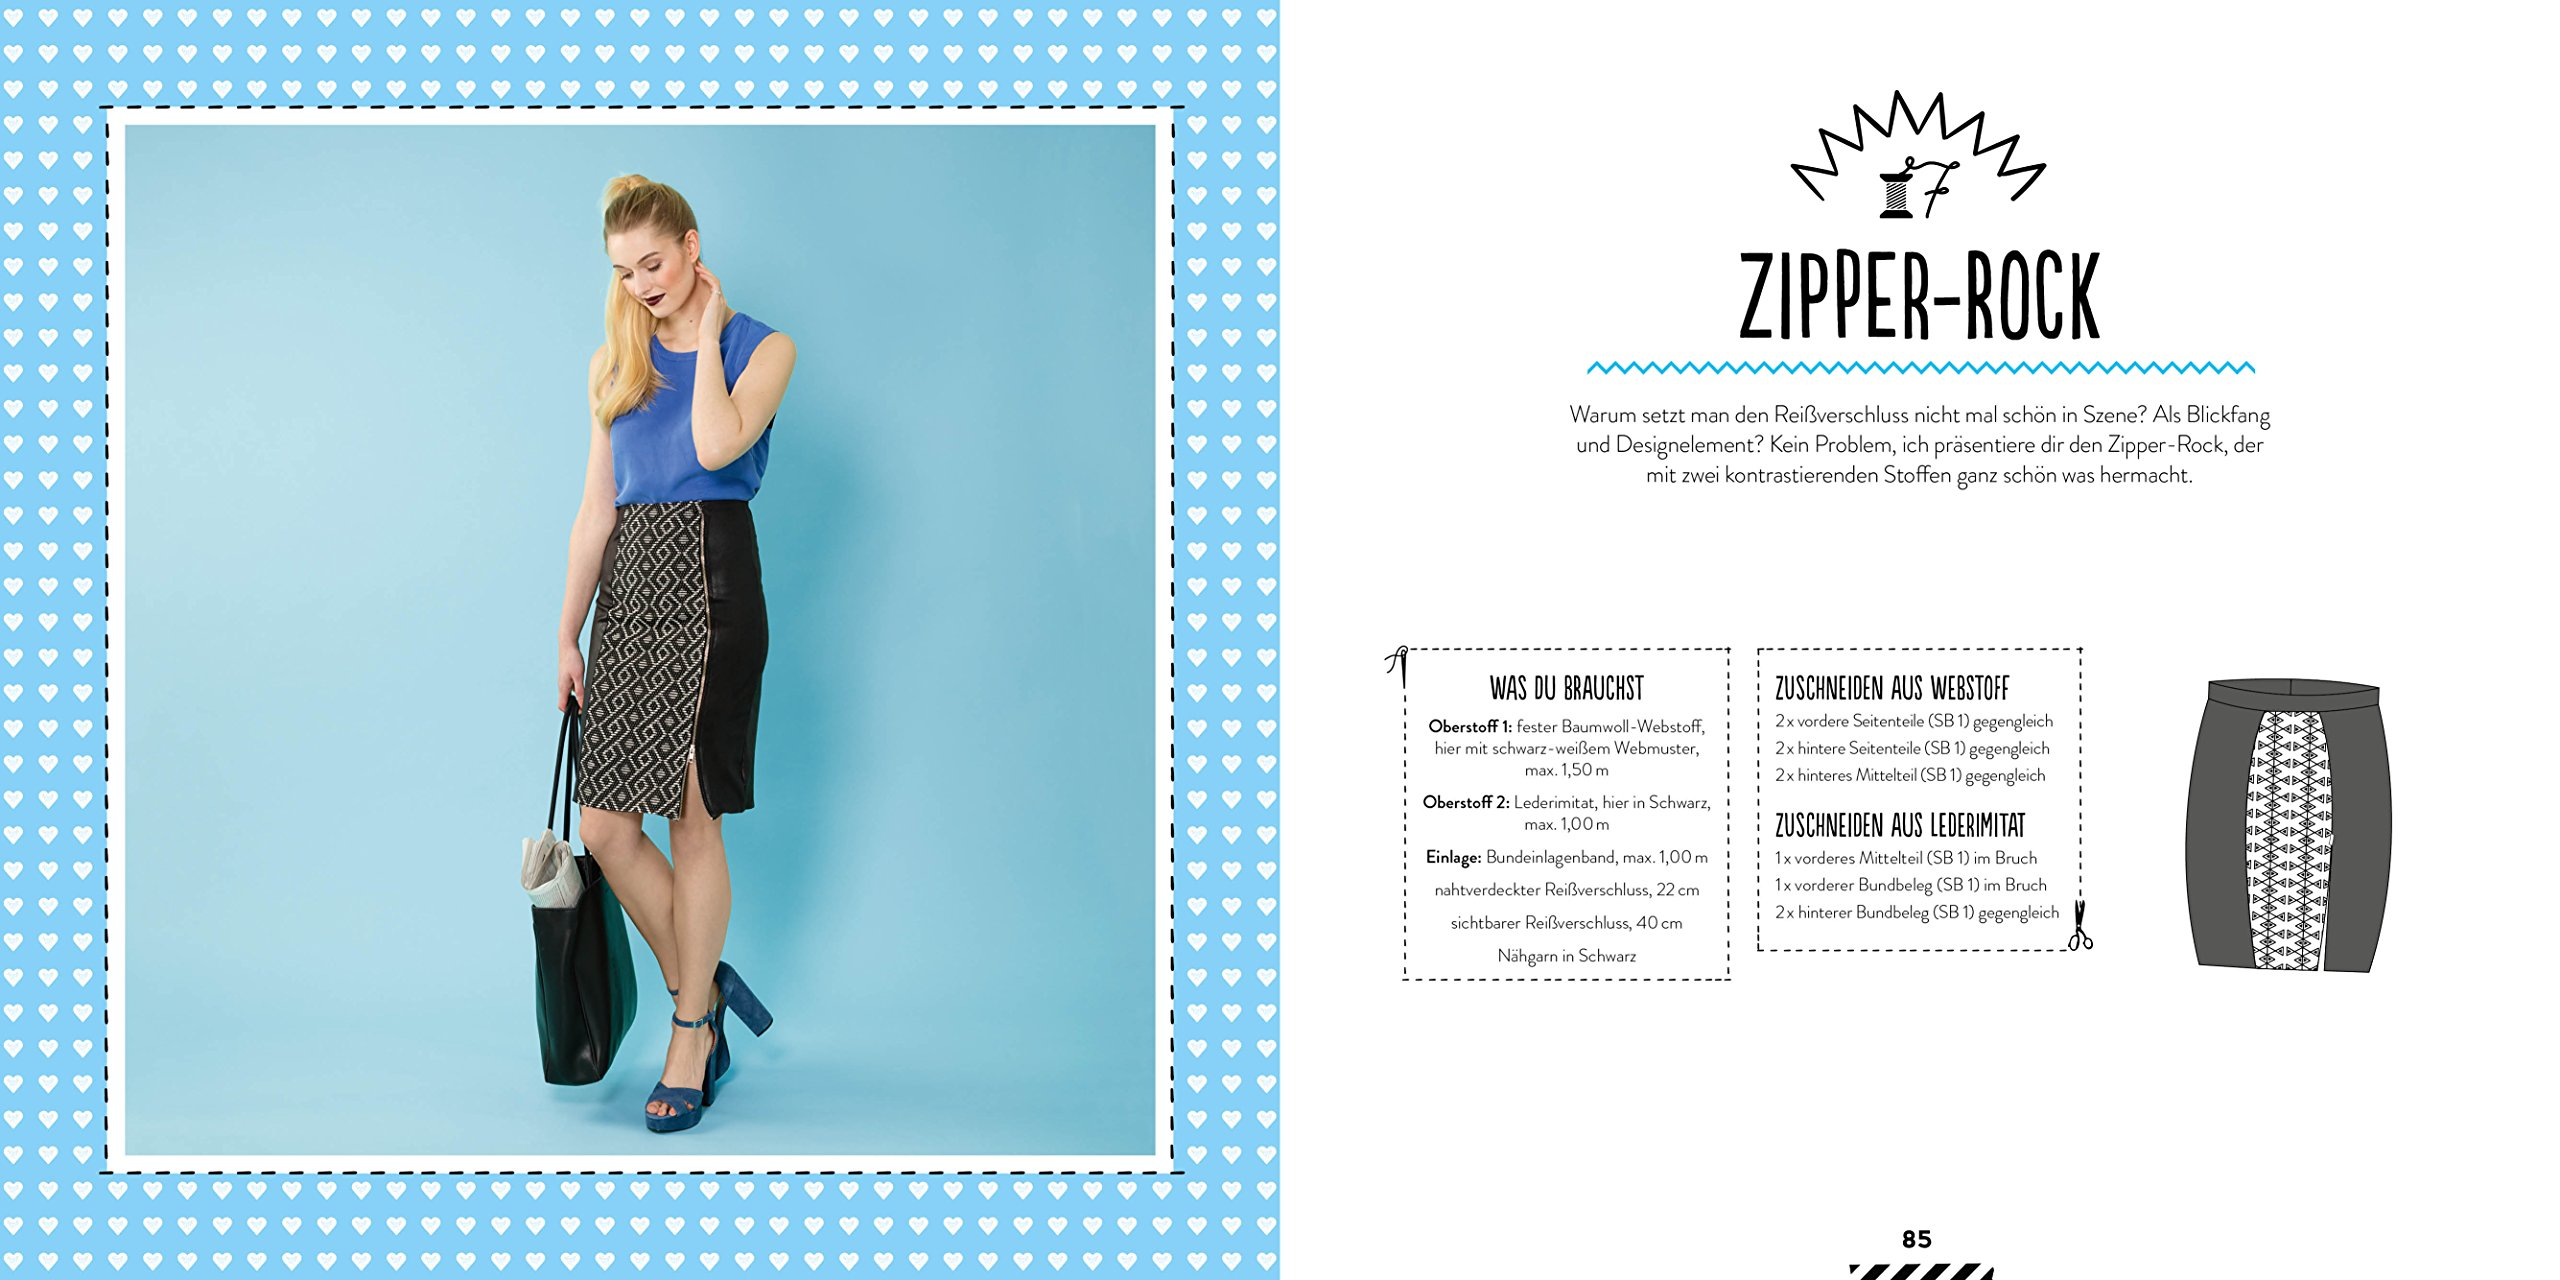 Ein Schnitt, zehn Röcke: Schnittteile kombinieren - Lieblingsröcke ...